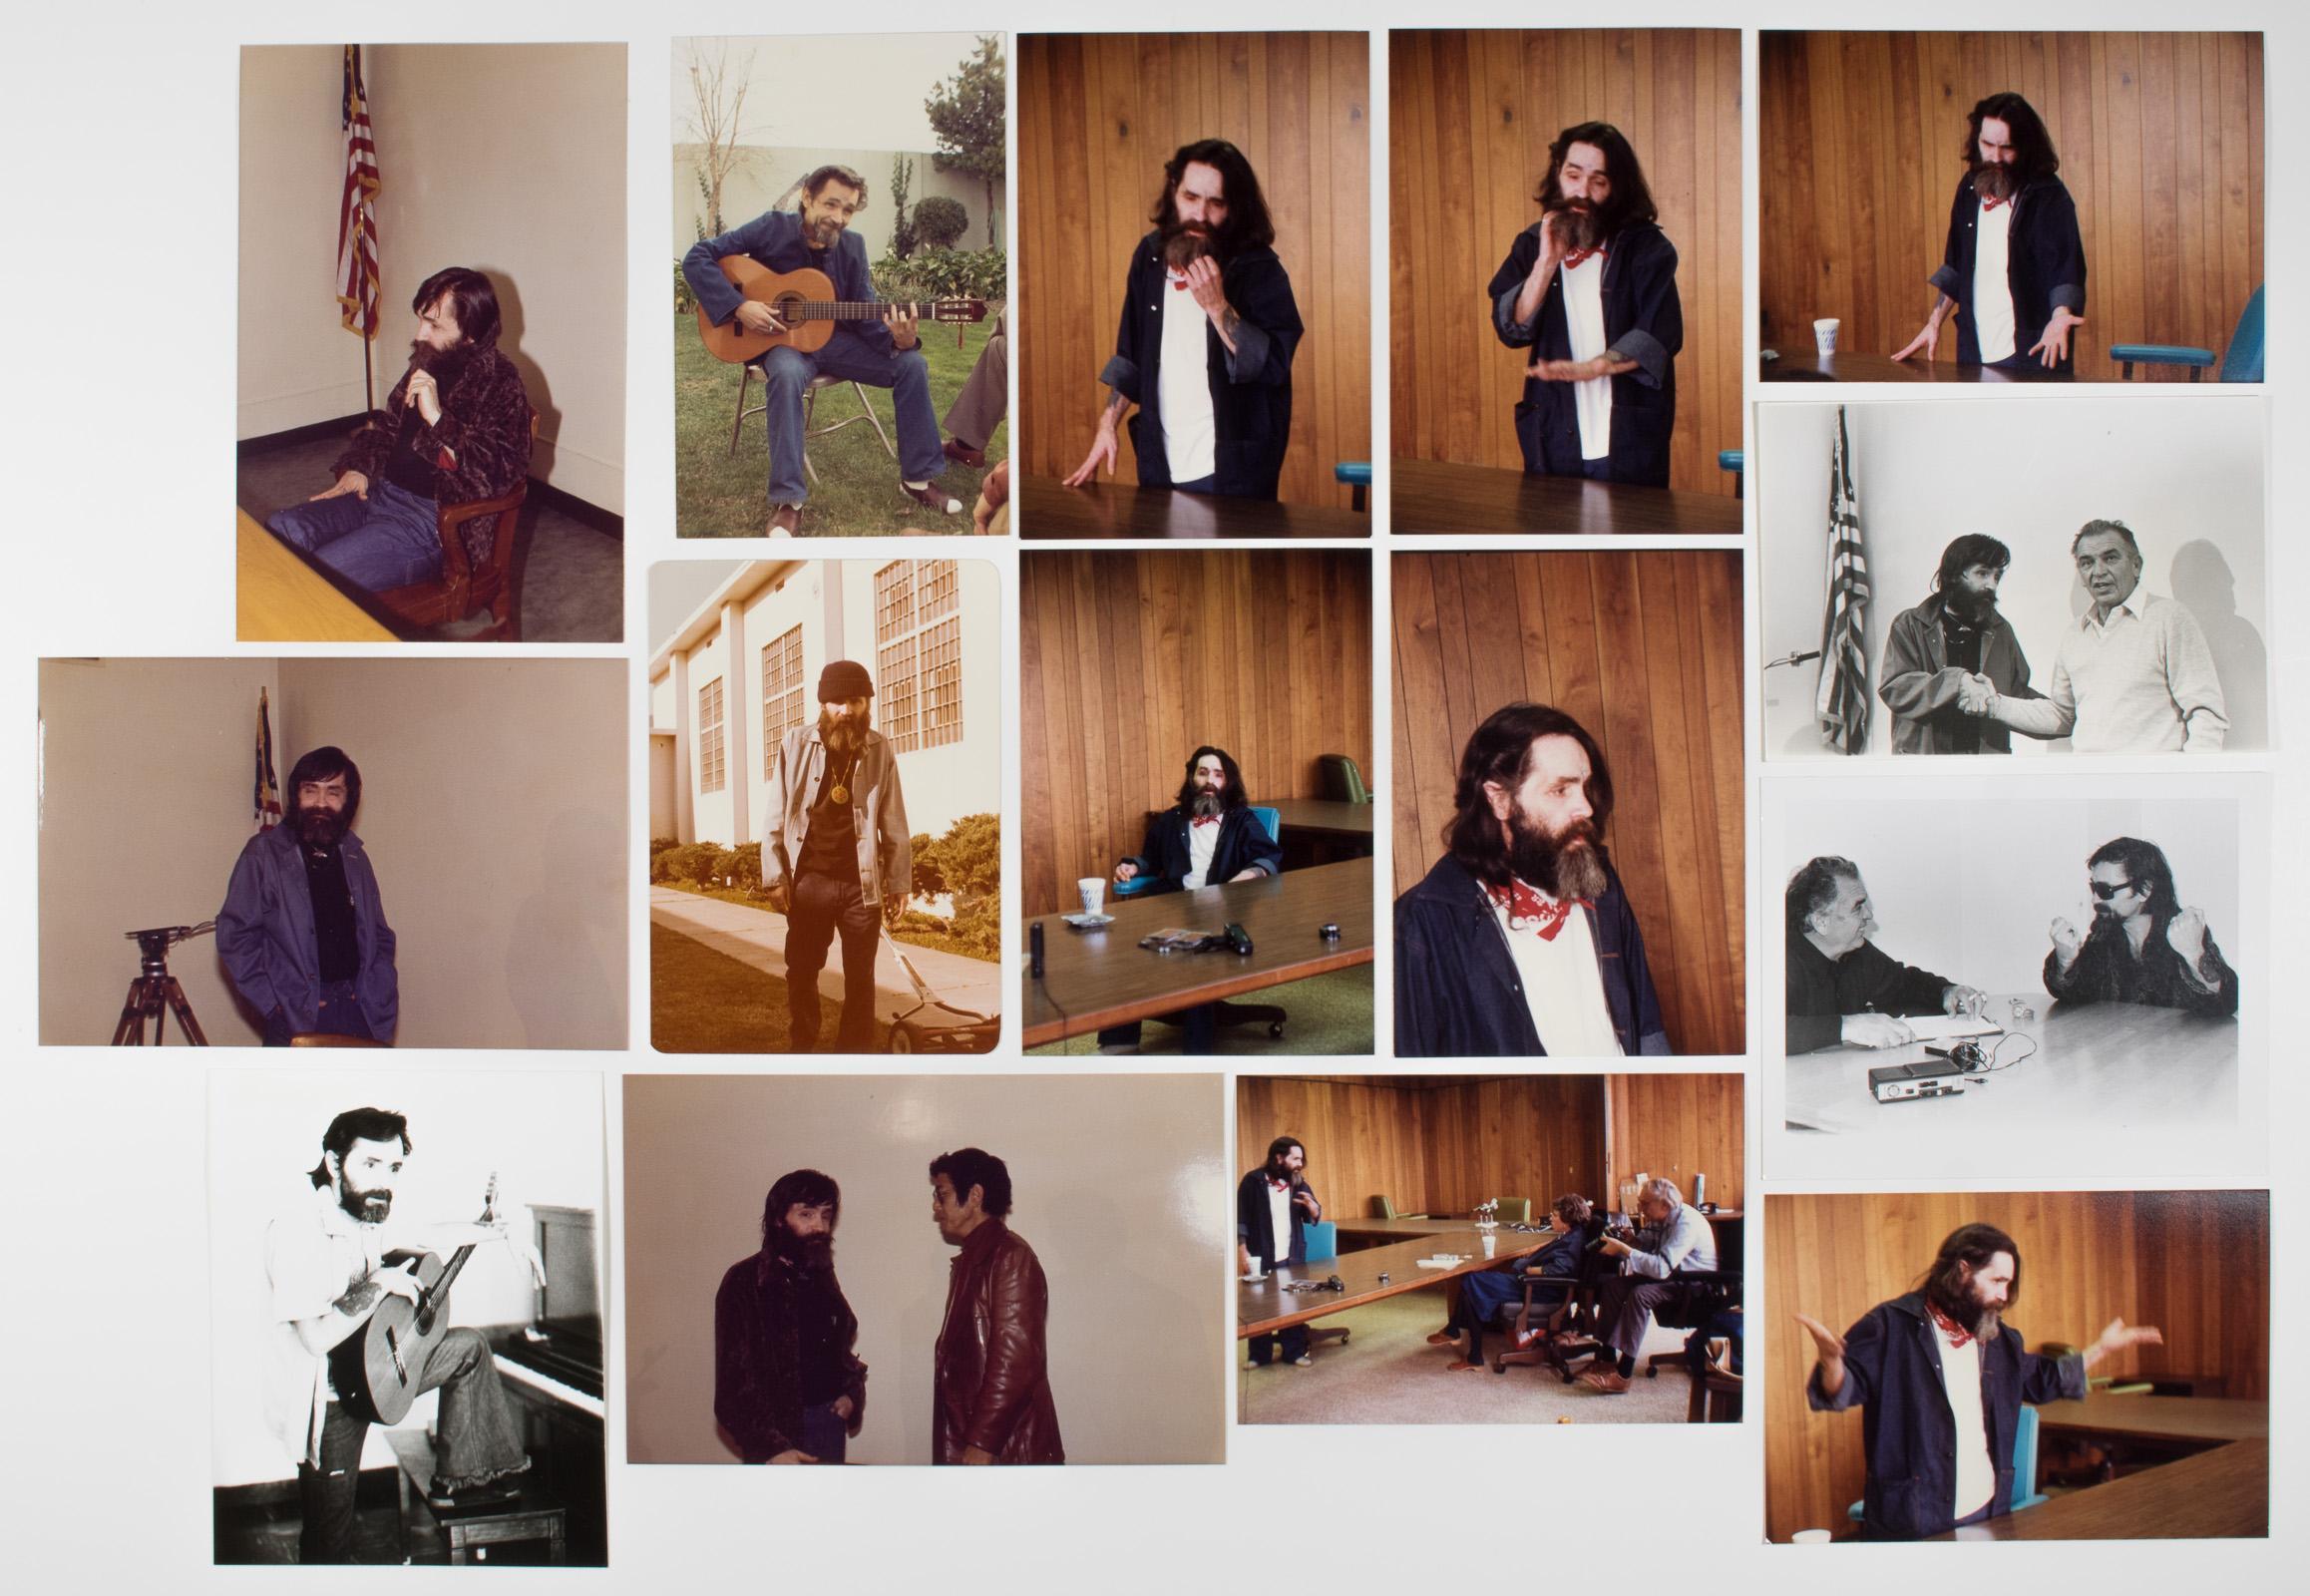 CHARLES MANSON PHOTOGRAPH GROUPING